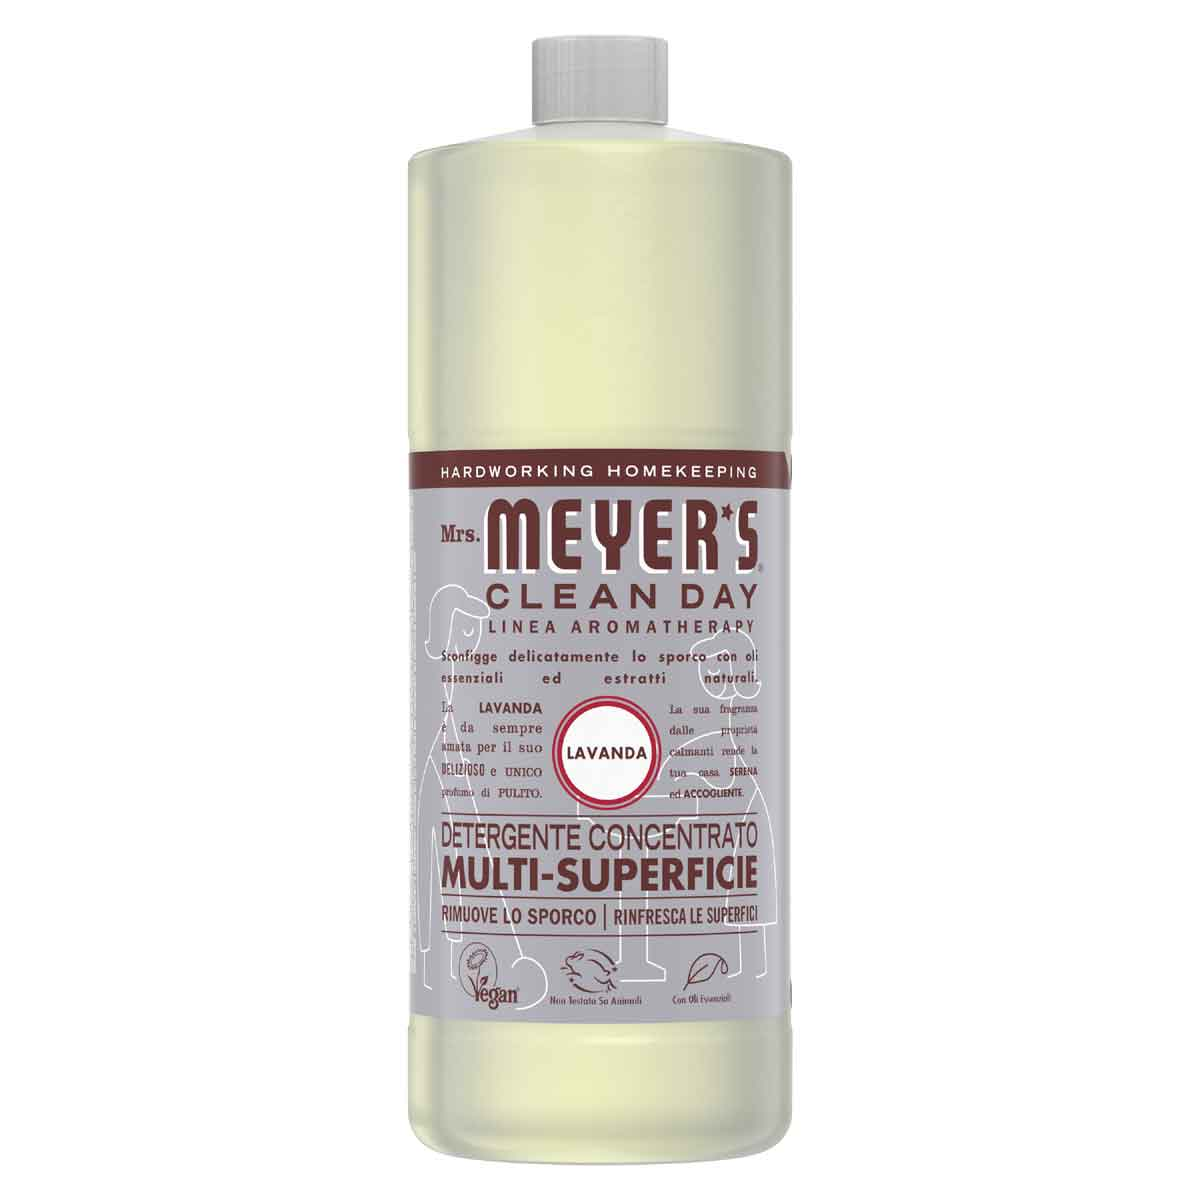 Mrs. Meyer's Detergente Concentrato multi-superficie Lavanda